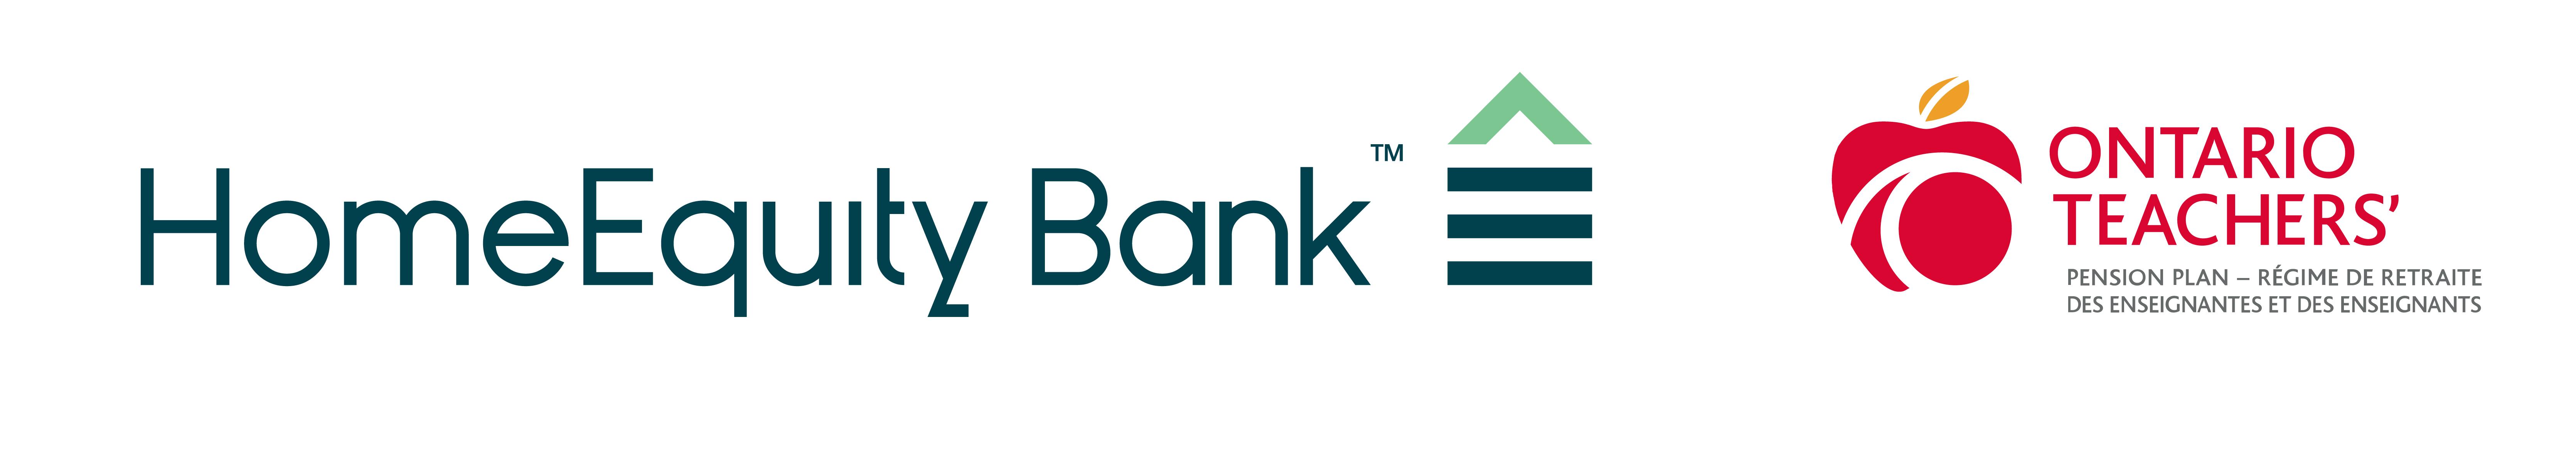 Ontario Teachers' announces agreement to acquire HomeEquity Bank